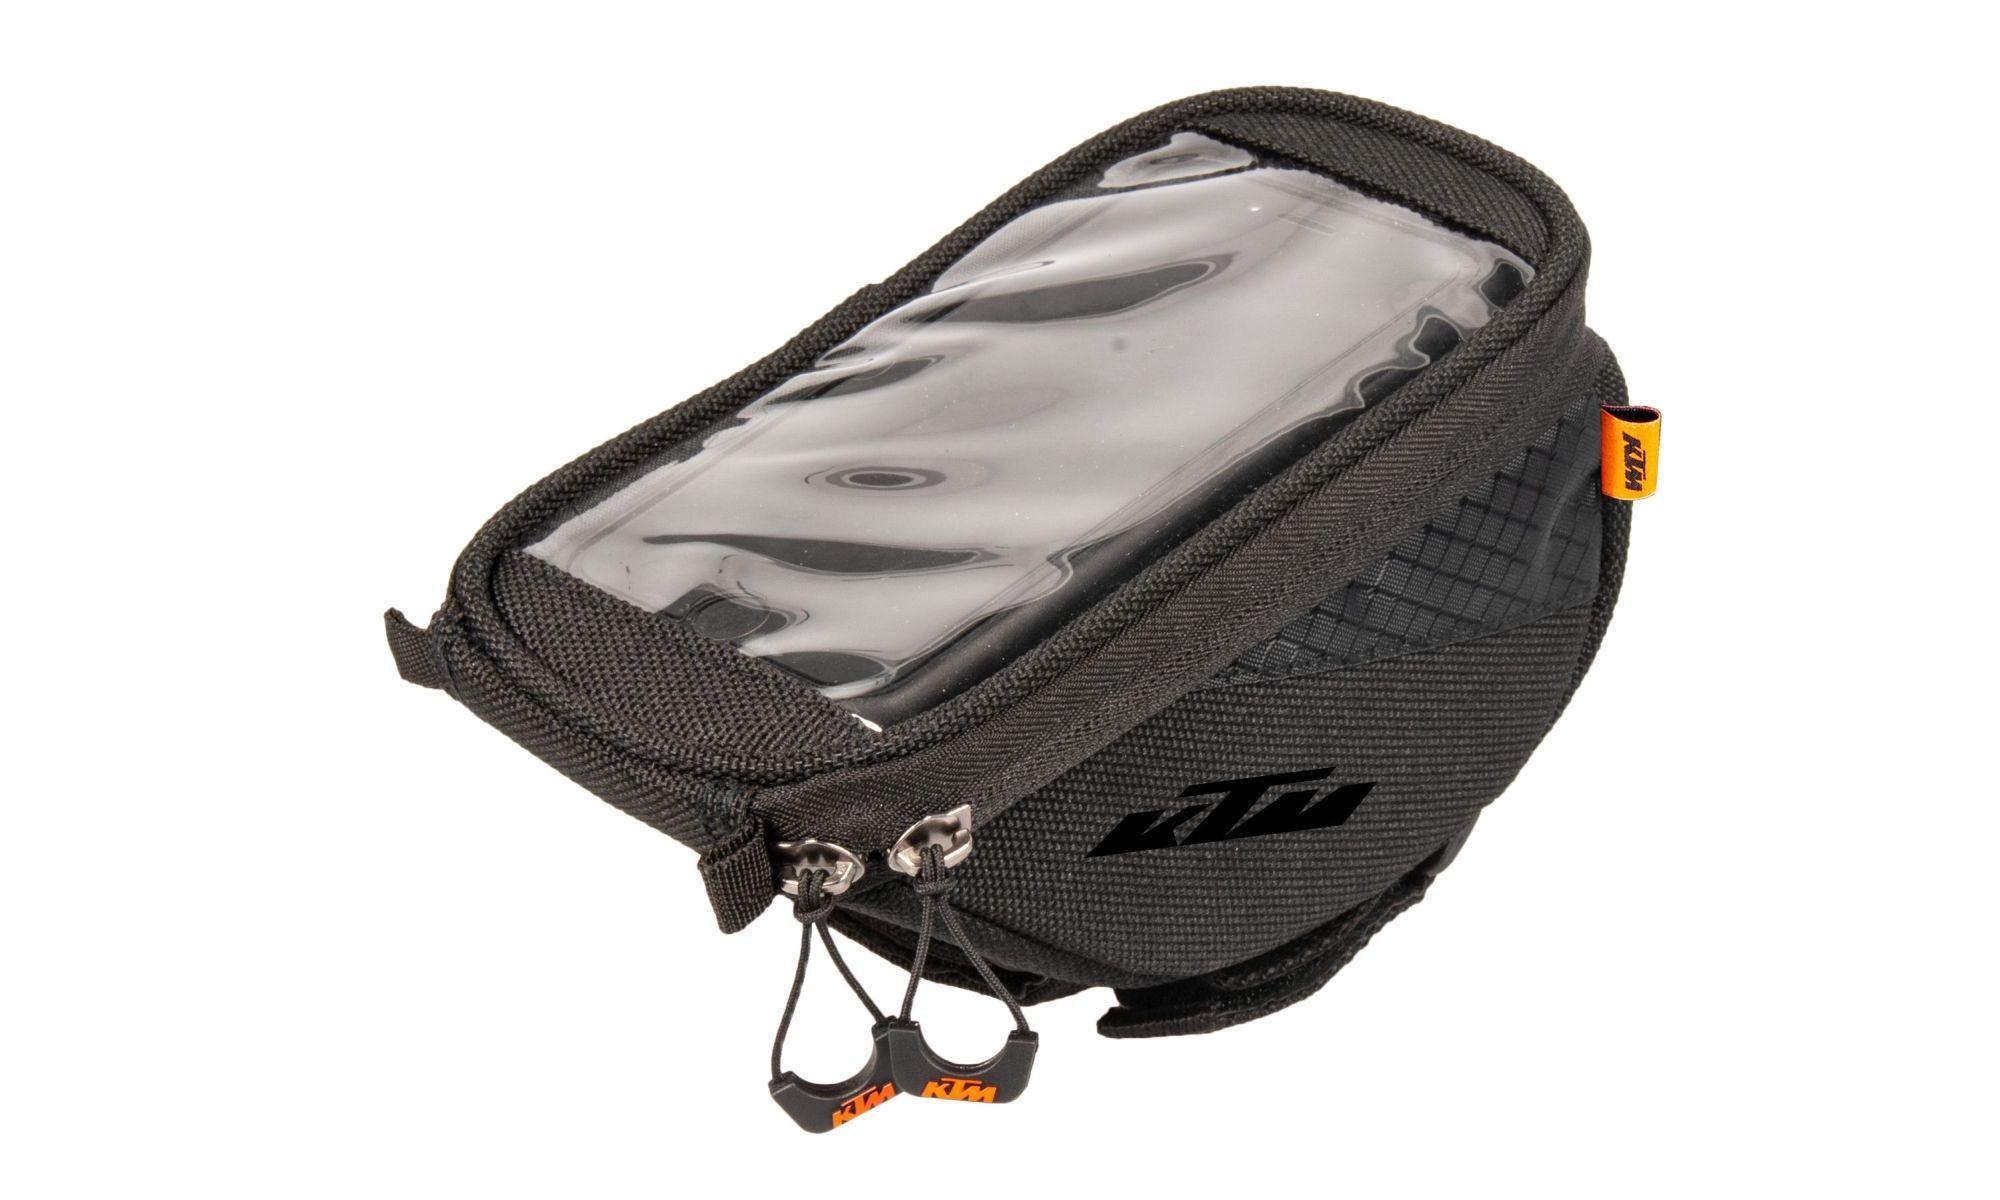 KTM Vorbautasche Phone Bag Stem II